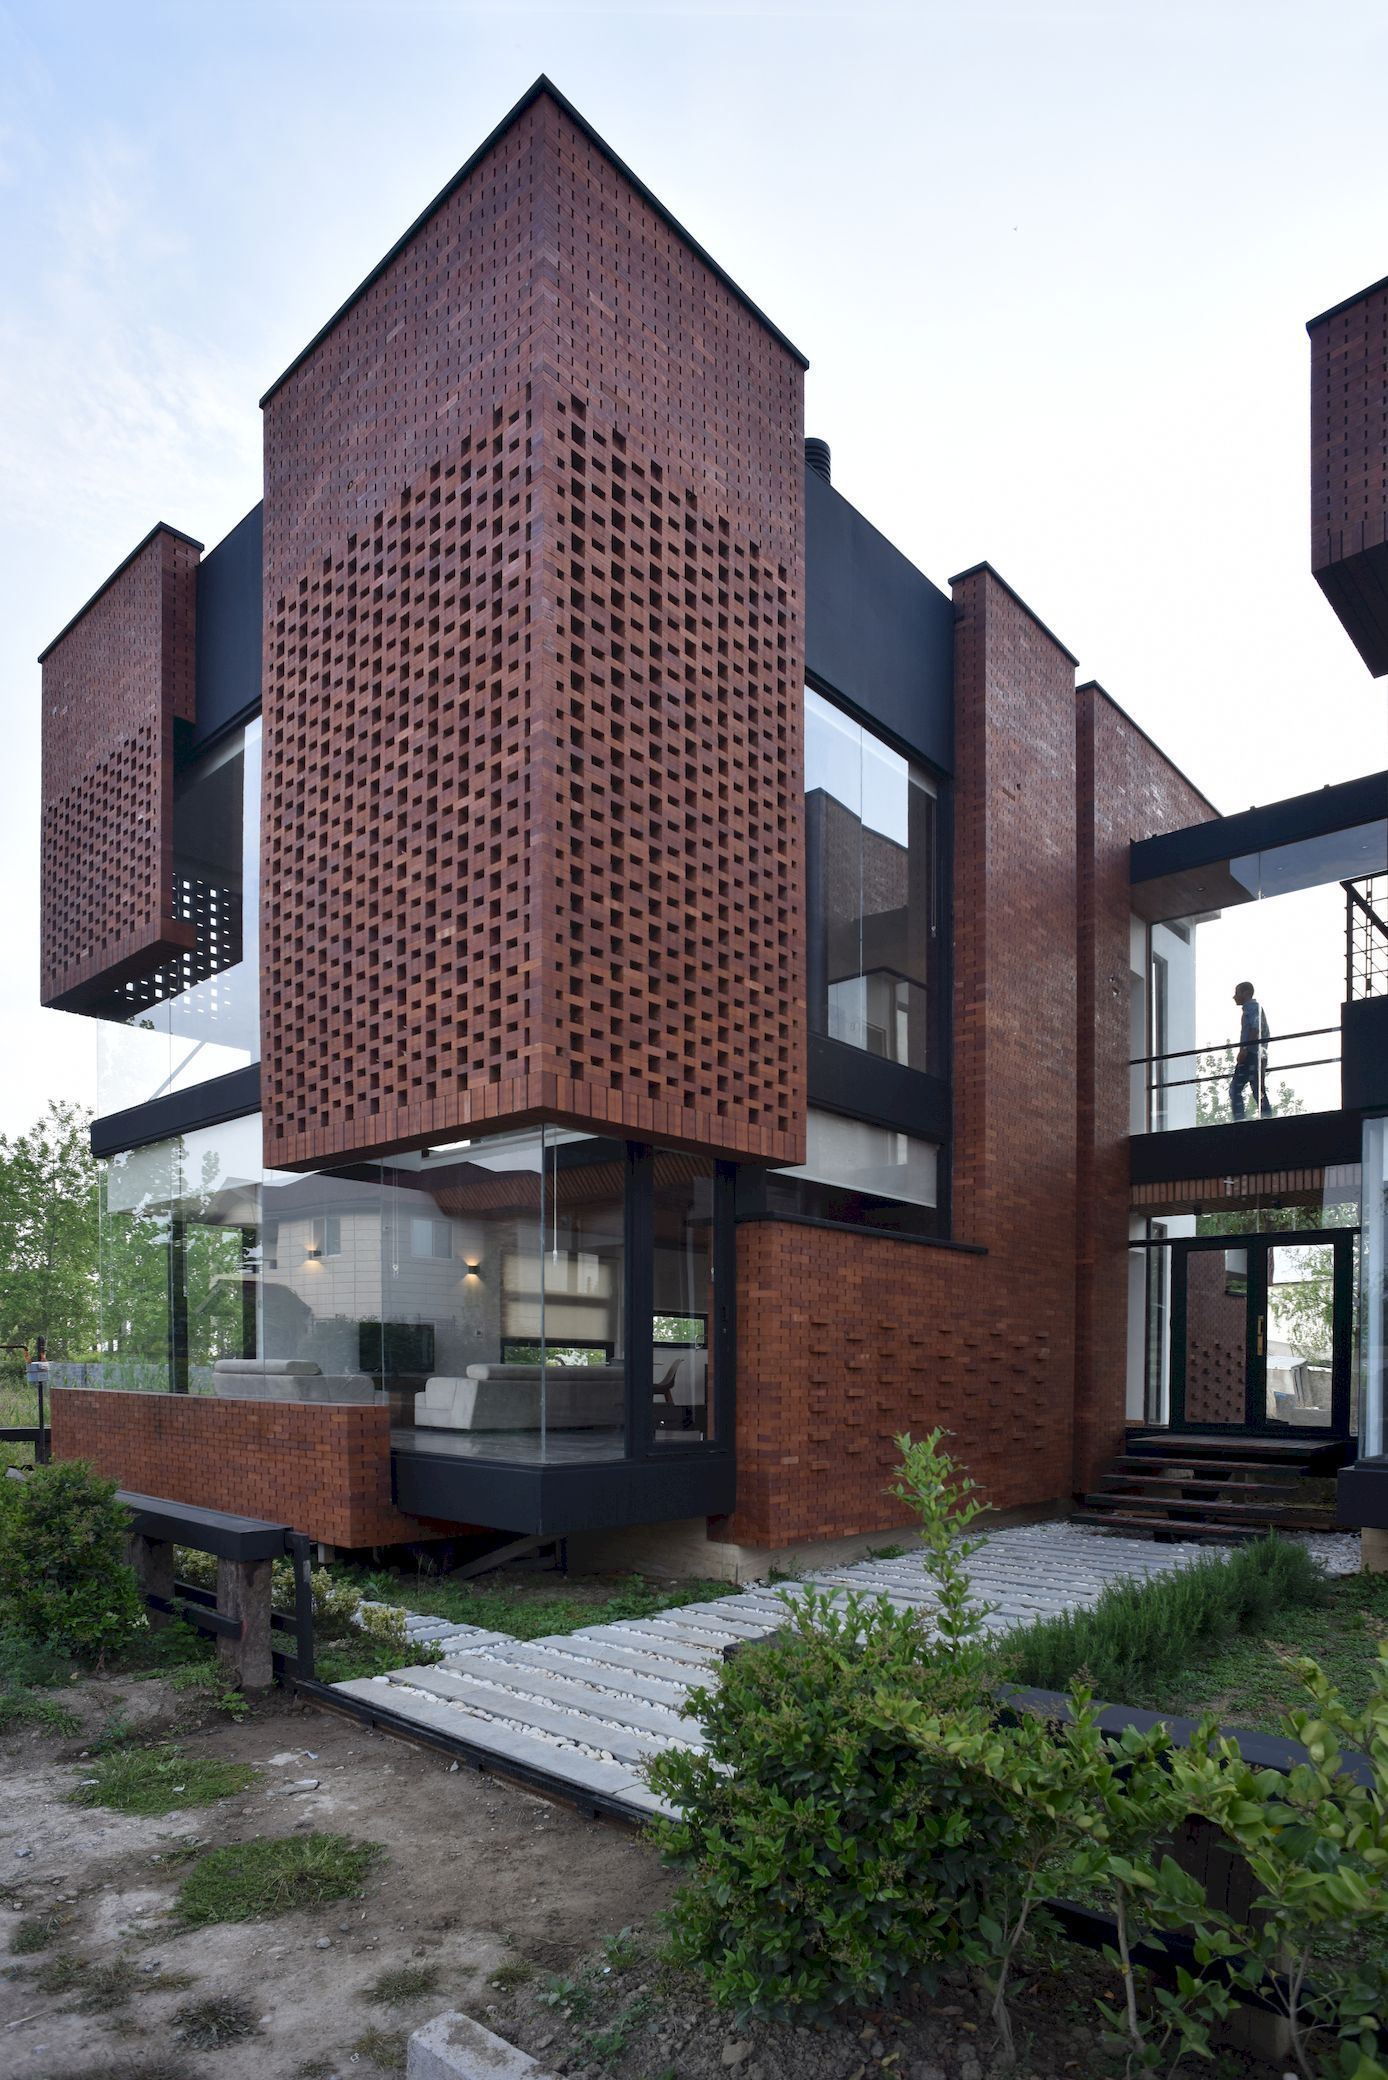 Maziar Brick House | Naghshe Khak Architectural Group #brick #BrickHouse #Glass #Iran #iron #NaghsheKhakArchitecturalGroup #stone #Structure #VahidJoudi #WoodMaziar #Brick #House #| #Naghshe #Khak #Architectural #Group ##brick ##BrickHouse ##Glass ##Iran ##iron ##NaghsheKhakArchitecturalGroup ##stone ##Structure ##VahidJoudi ##Wood #brick